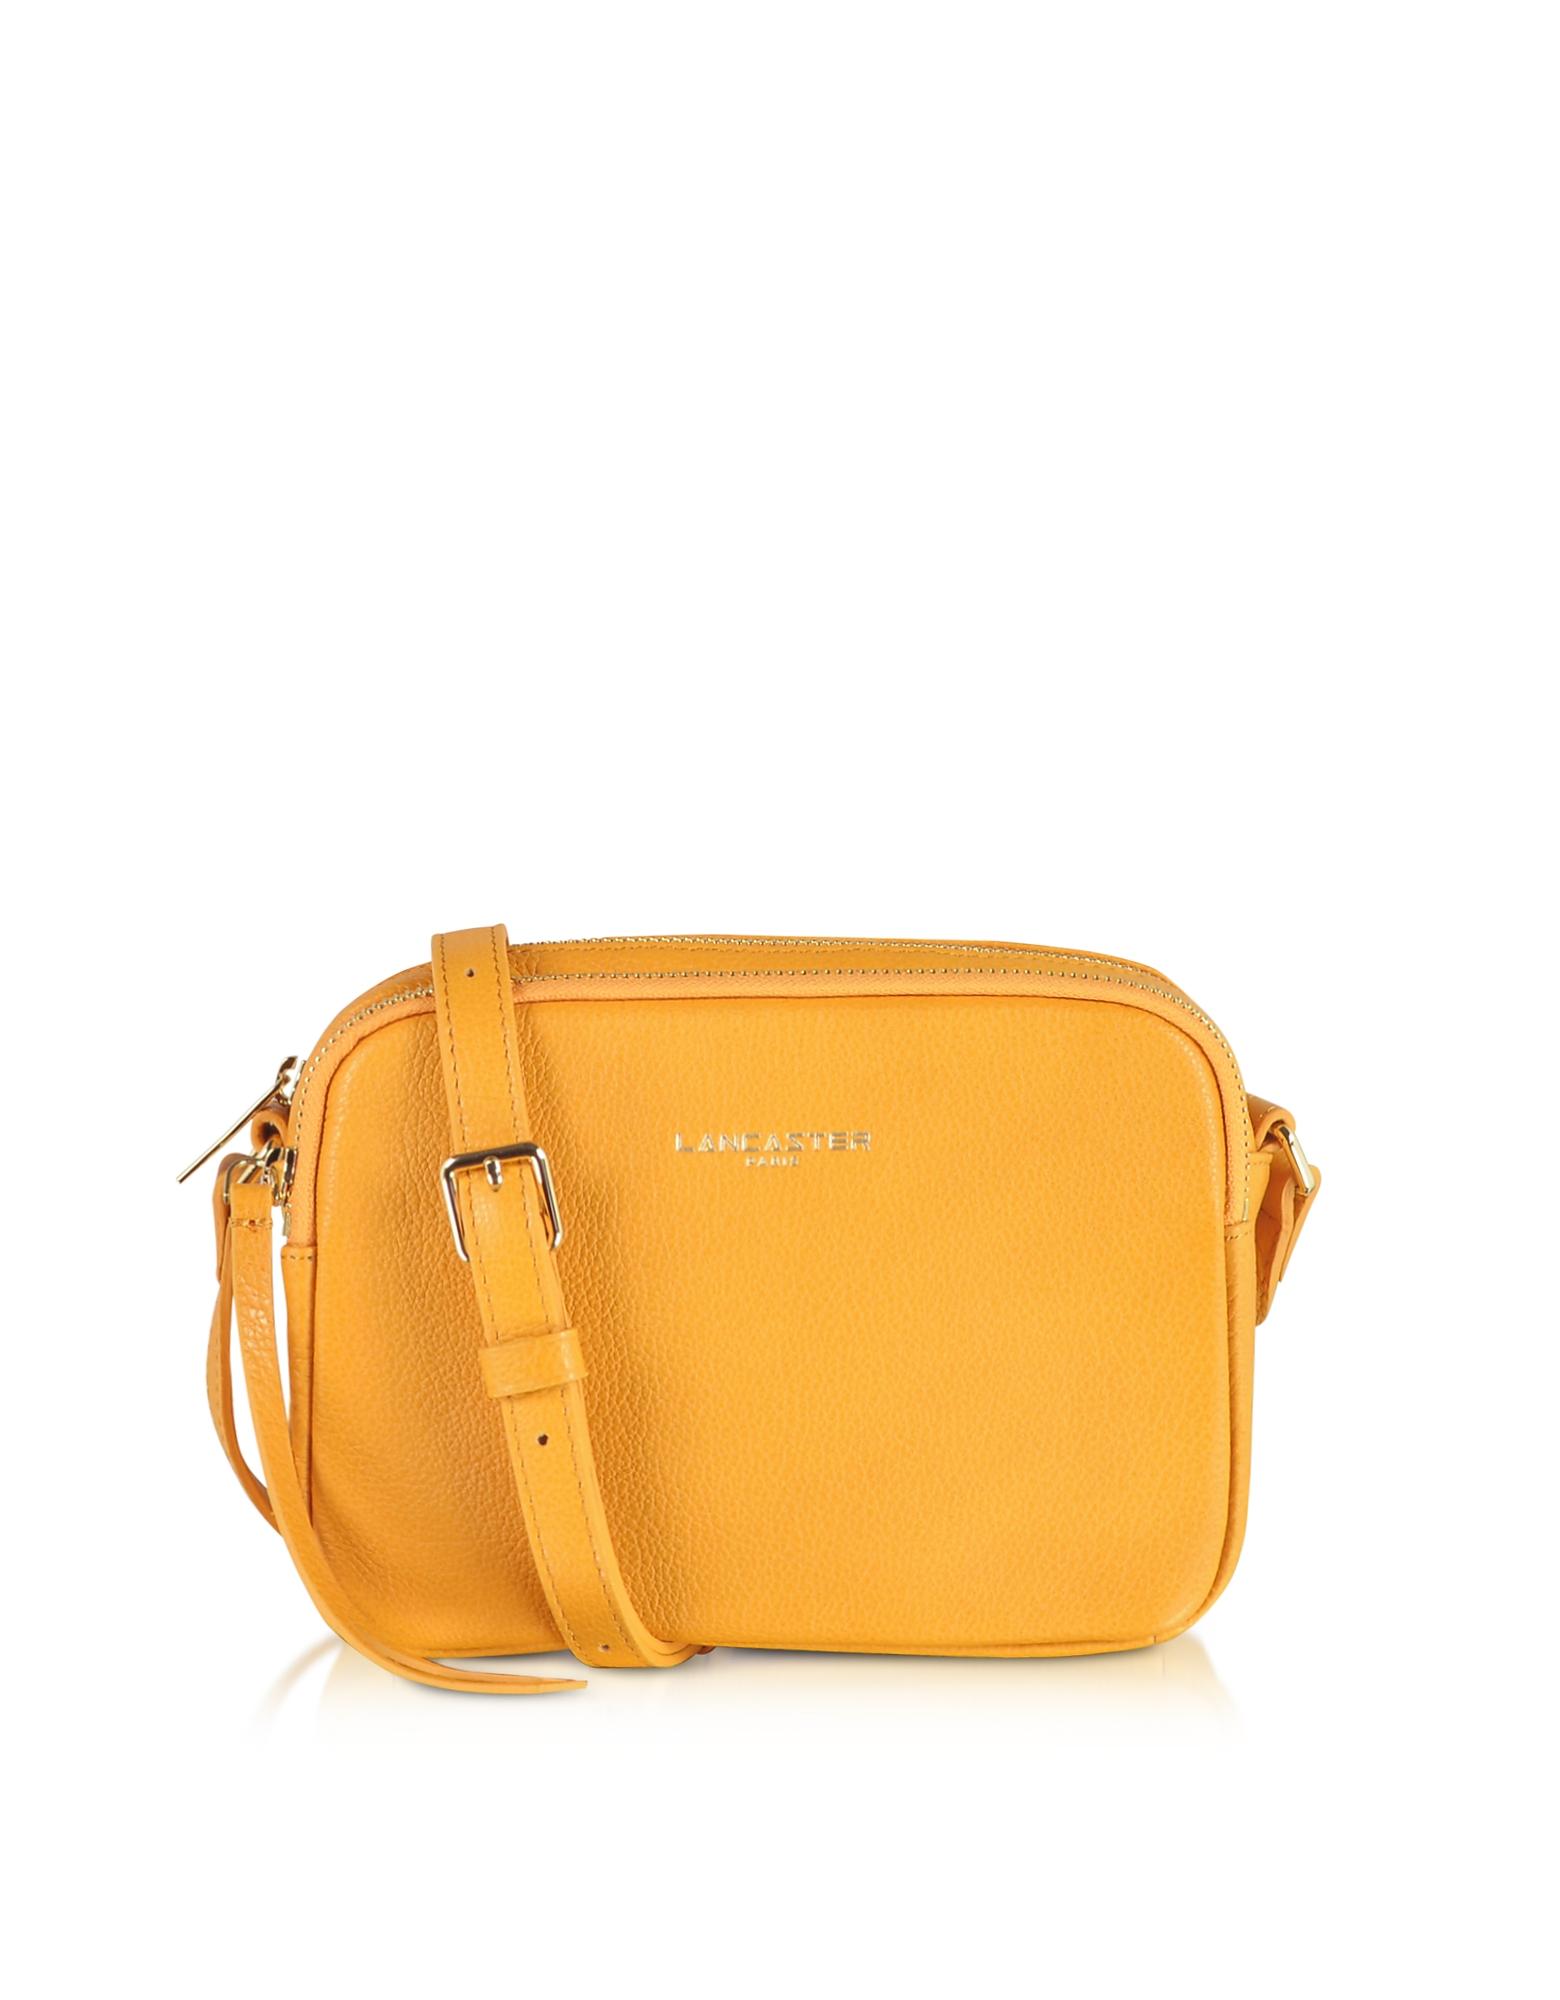 Lancaster Paris Designer Handbags, Dune Mini Crossbody Bag